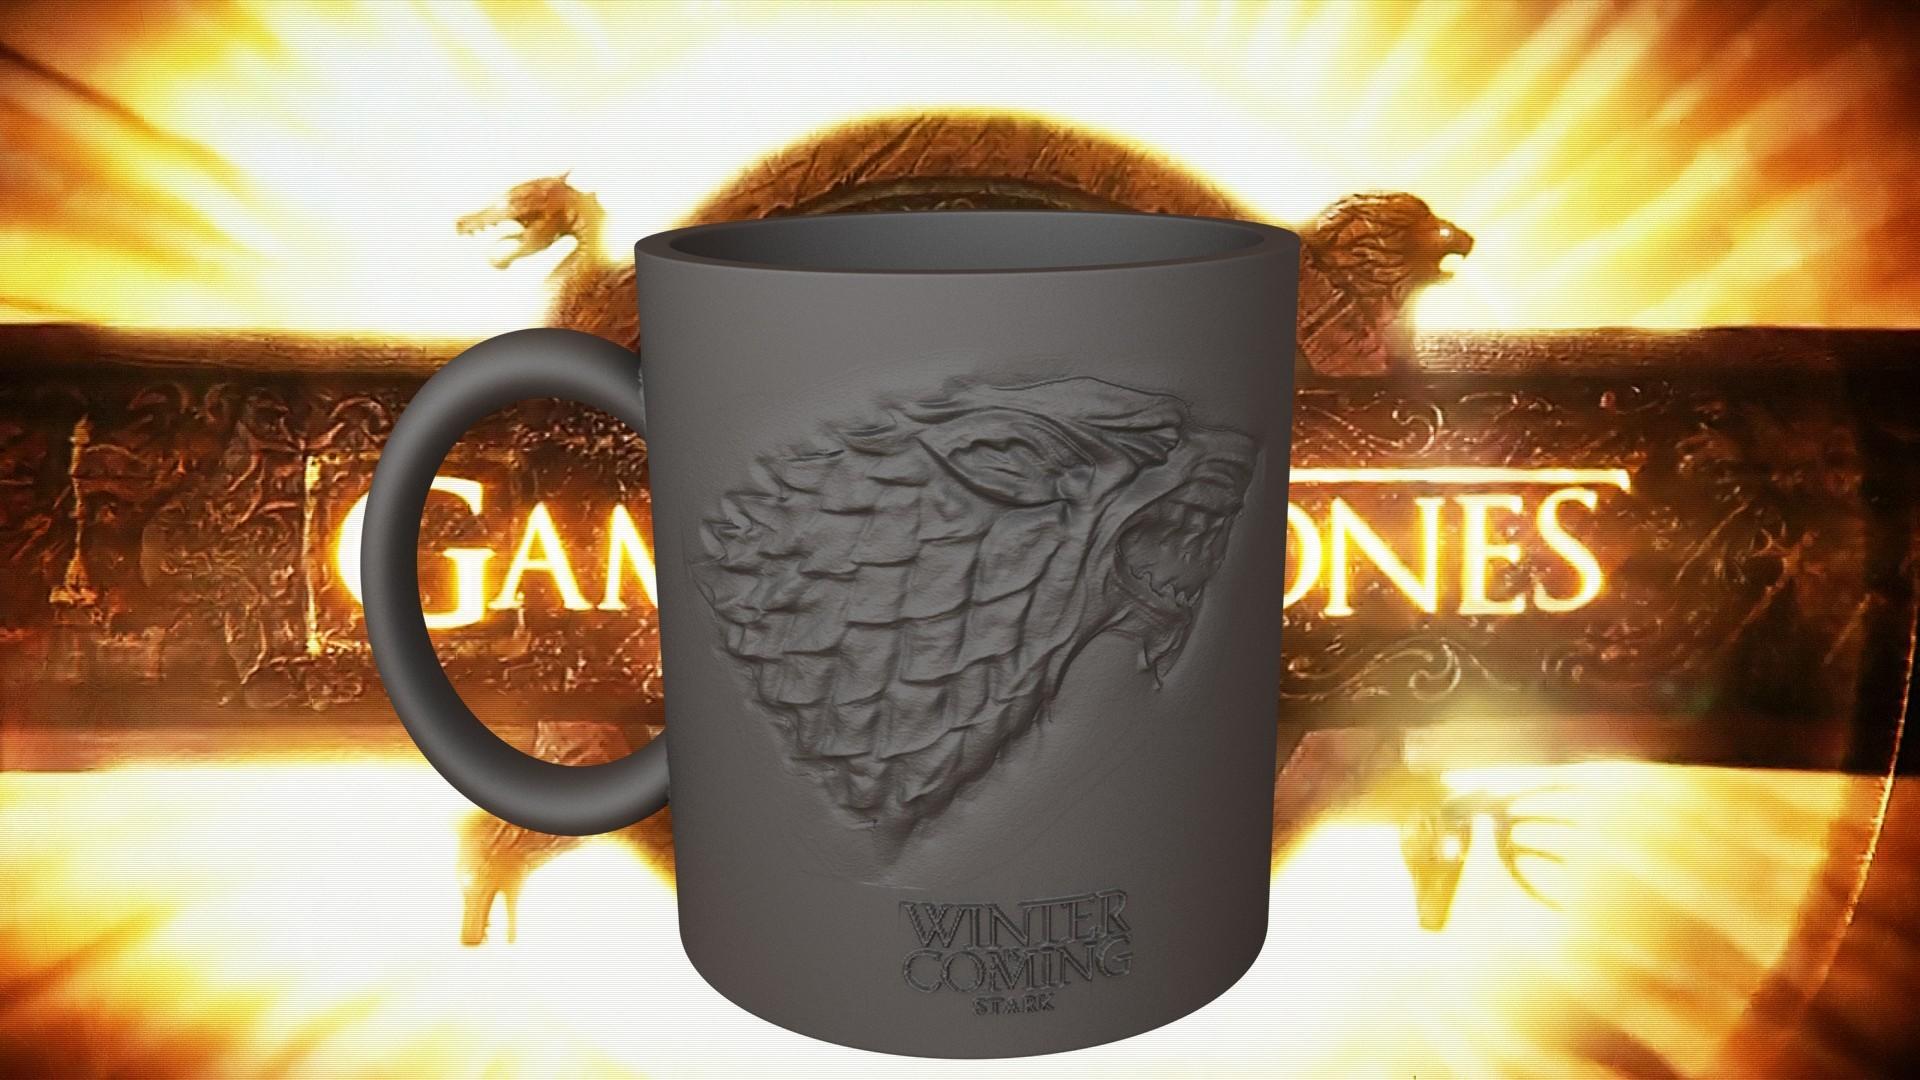 1.2.jpg Download STL file Game Of Thrones Stark Coffee Mug • 3D printer object, SimaDesign